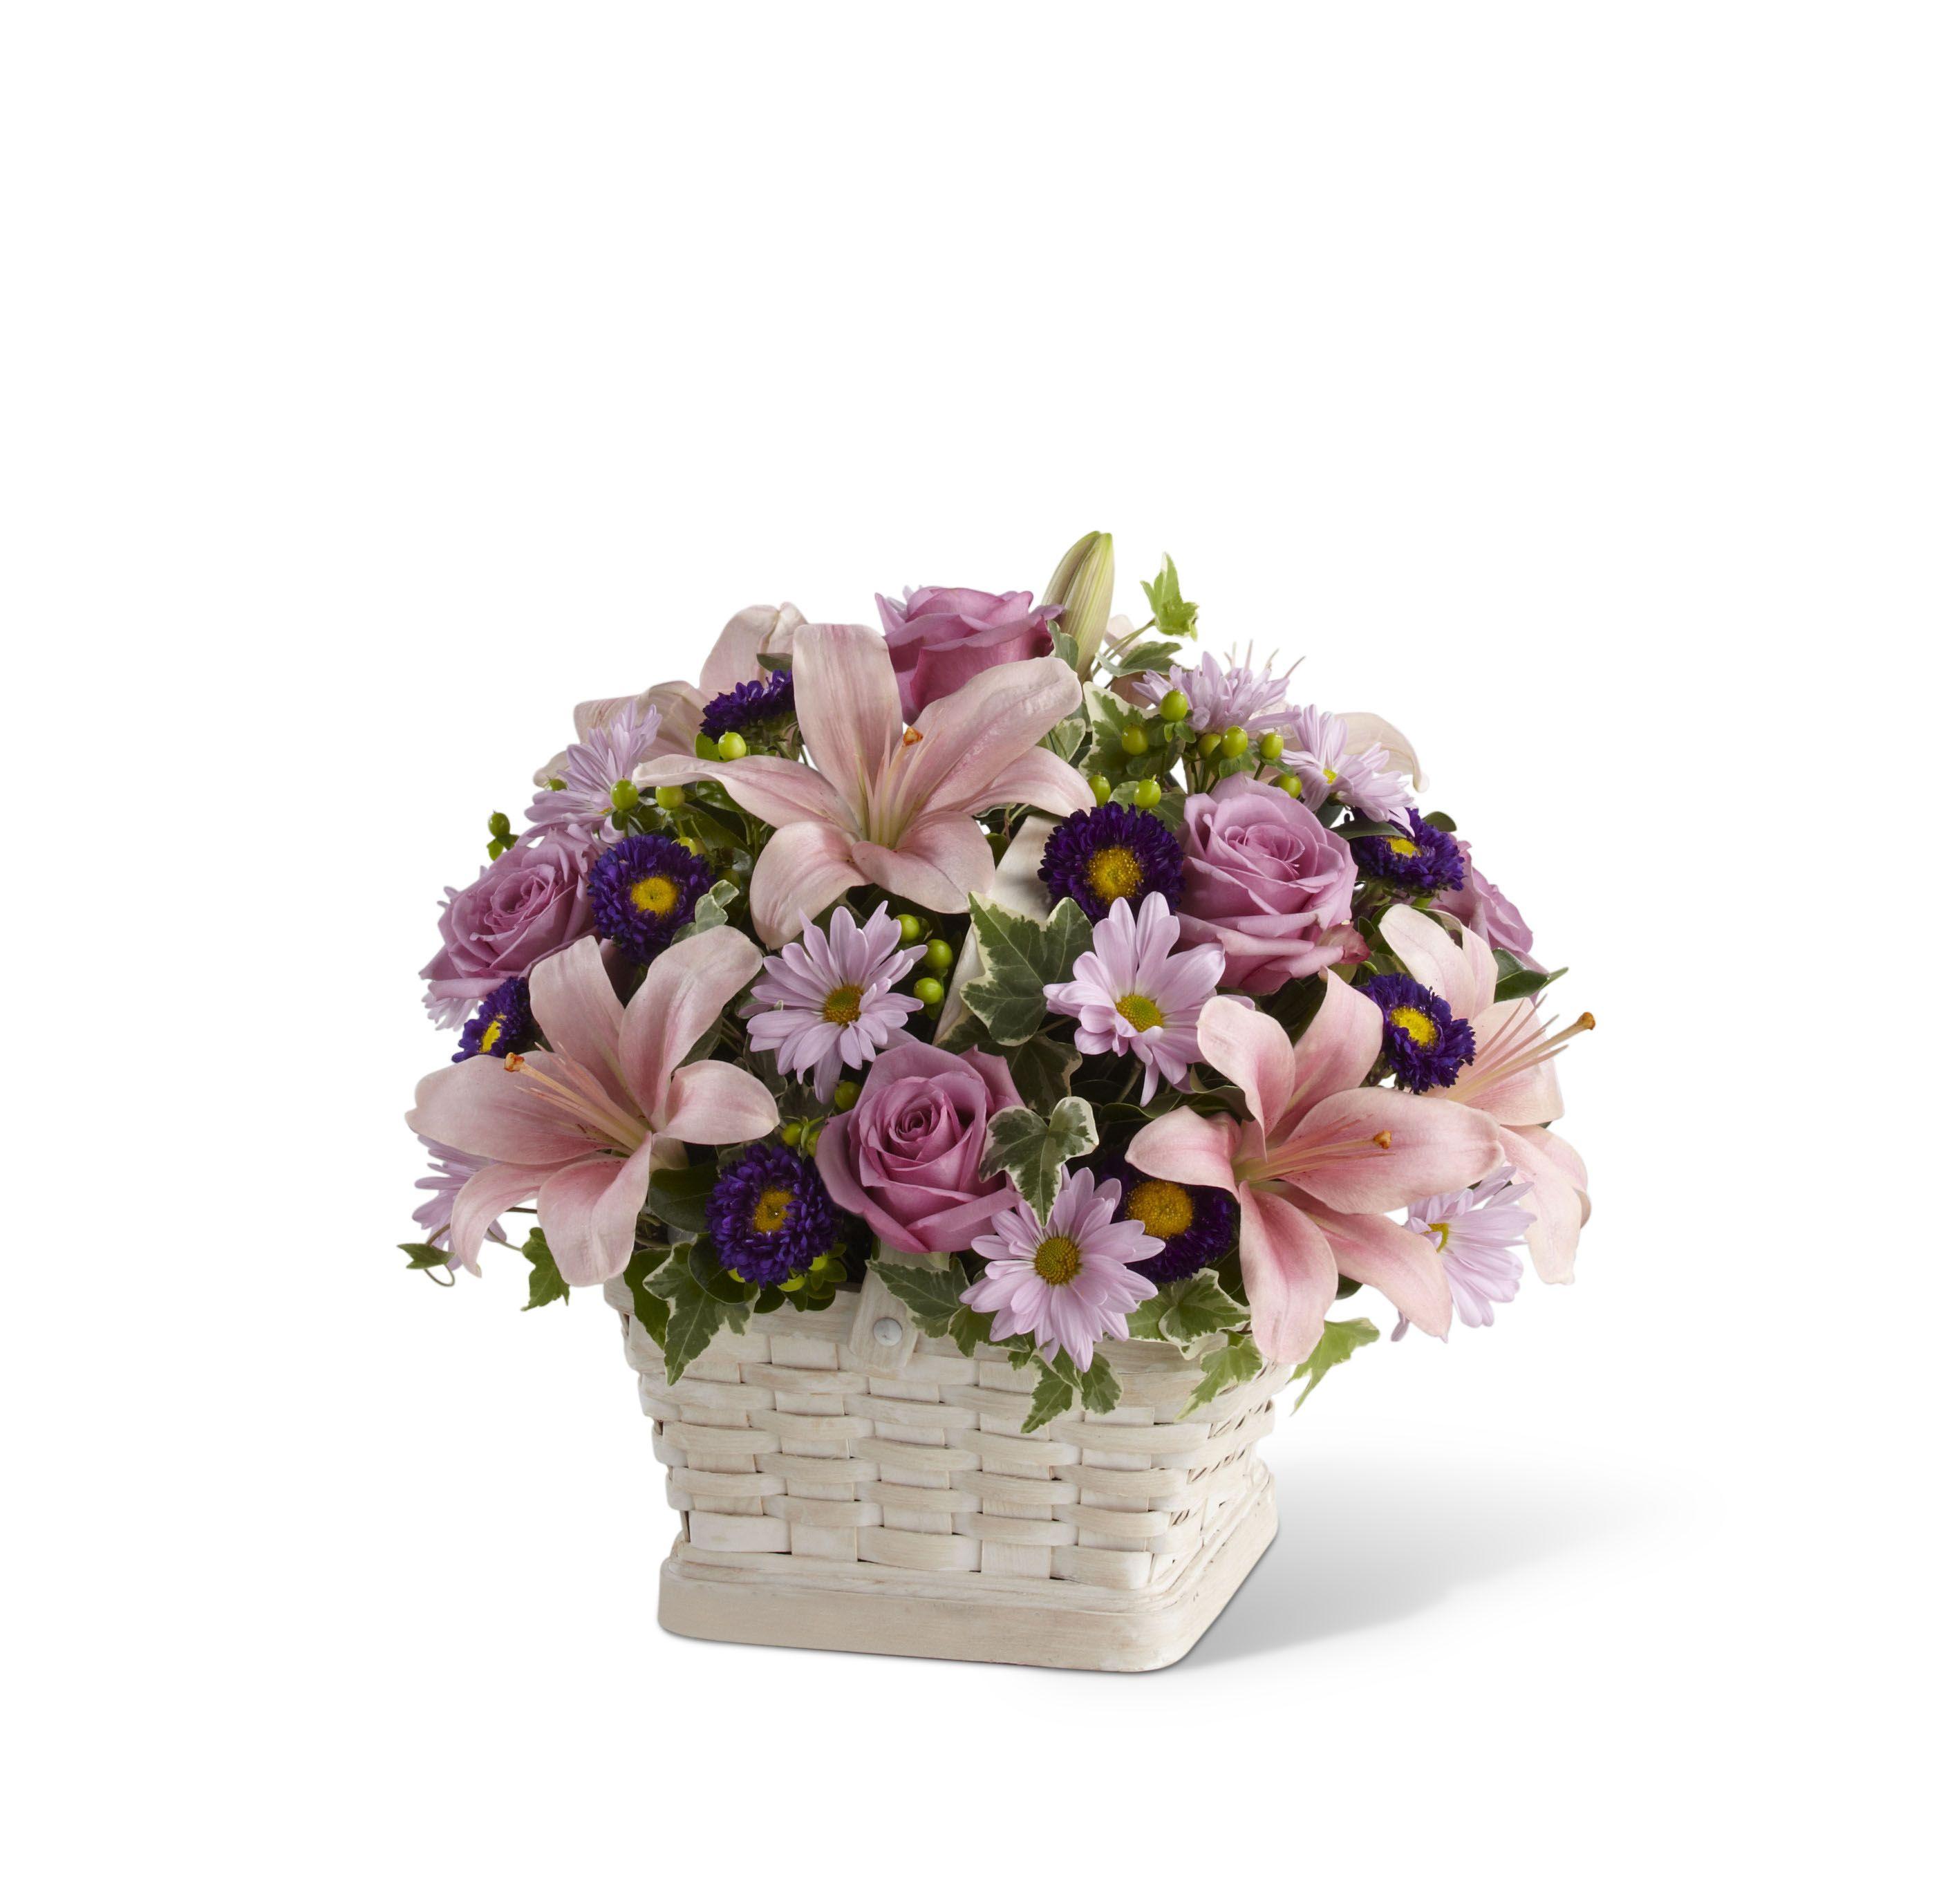 Flower basket arrangement ideas the loving sympathy basket flower basket arrangement ideas the loving sympathy basket arrangement s31 4509 izmirmasajfo